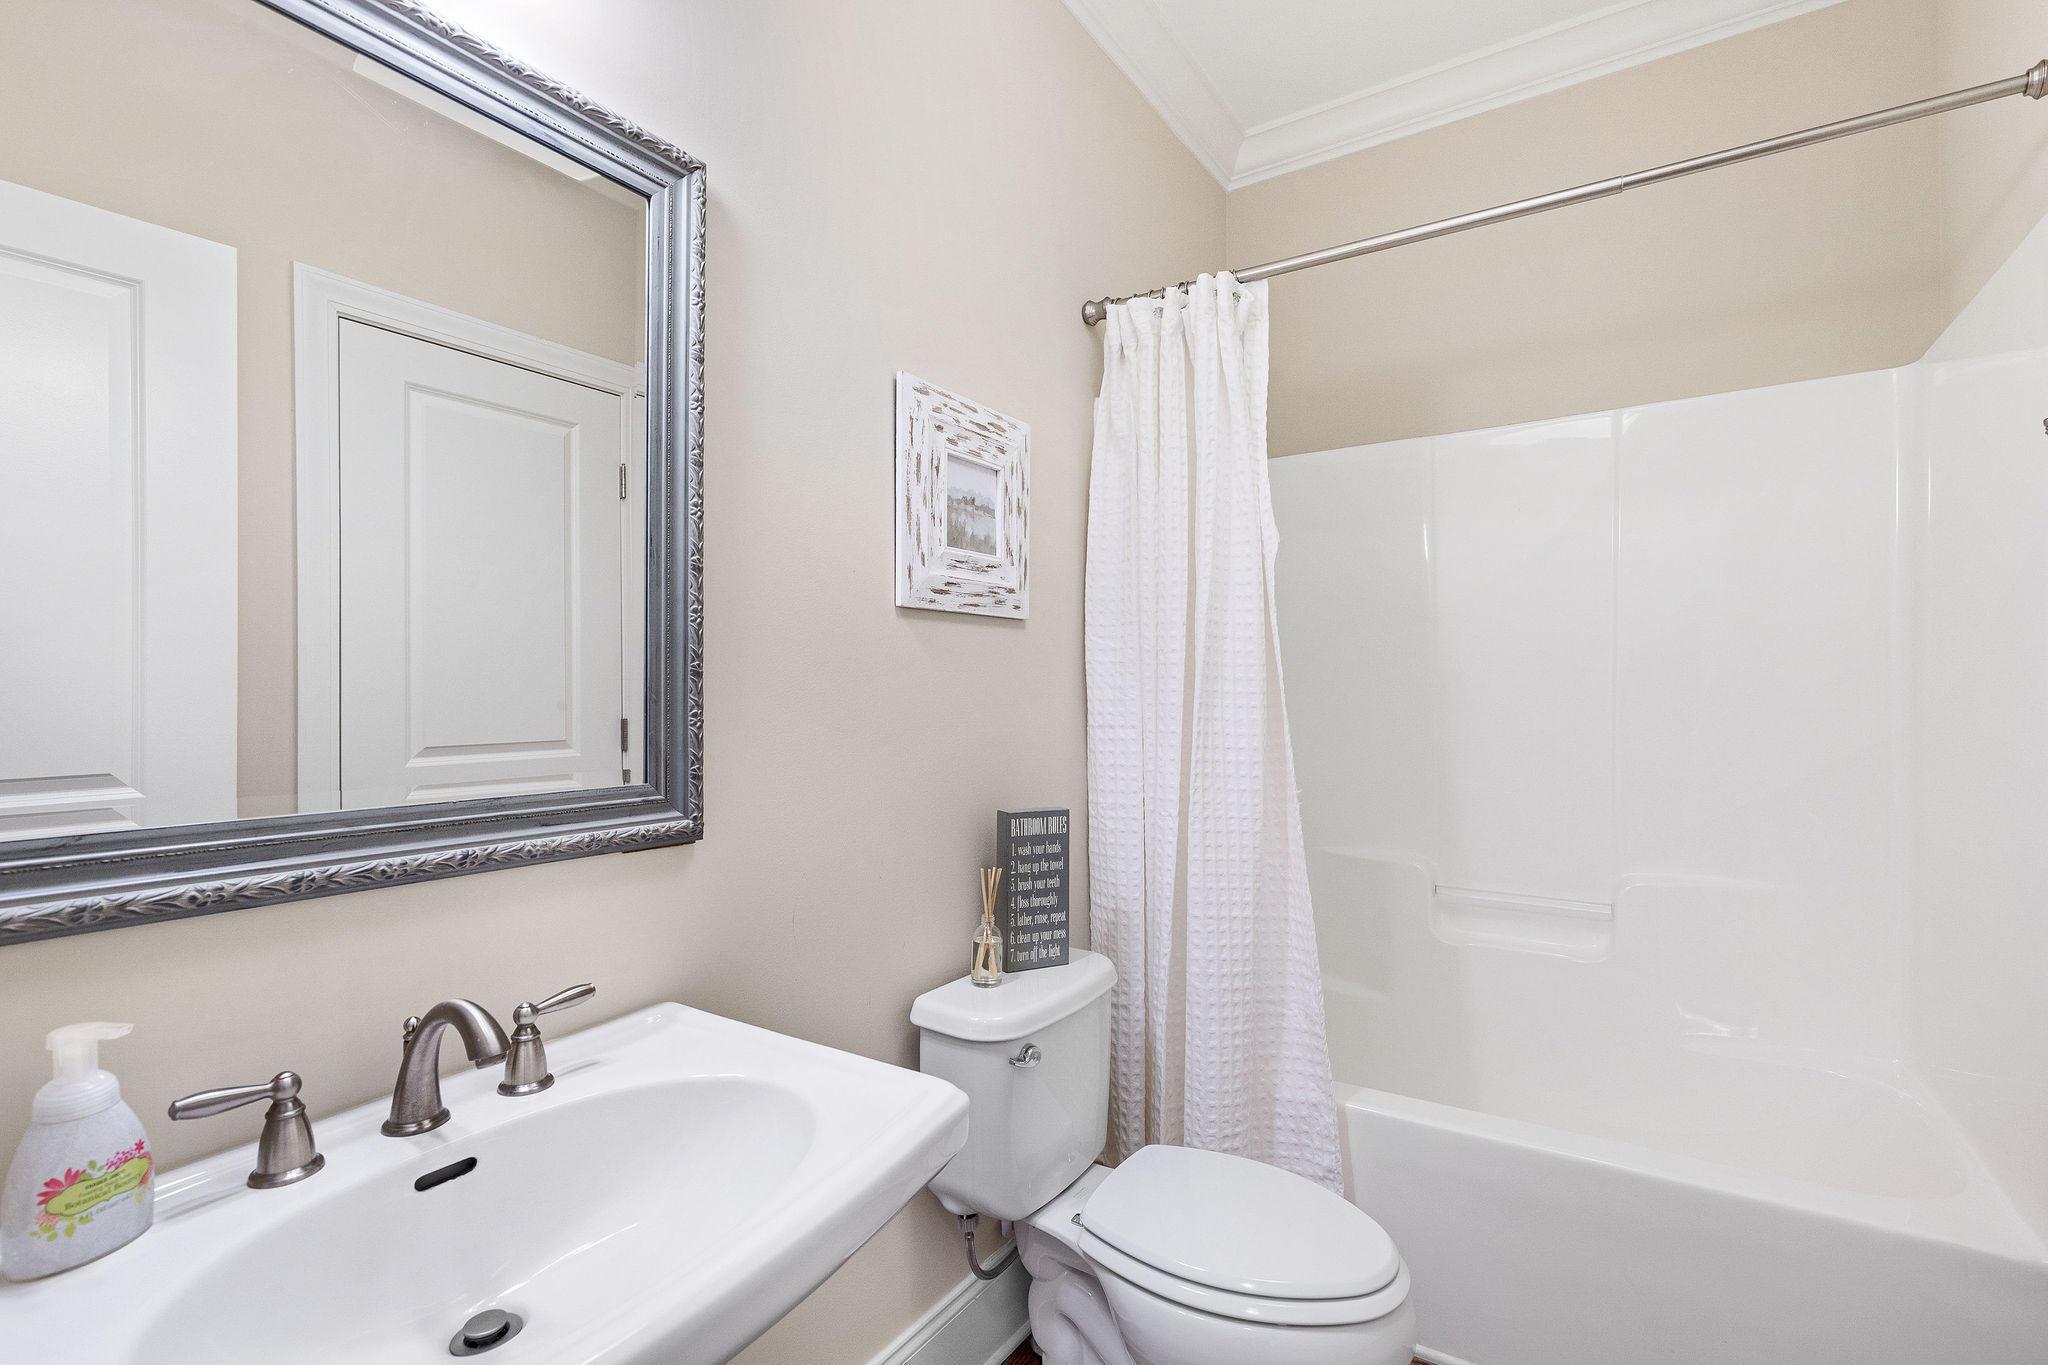 Dunes West Homes For Sale - 3212 Hatchway, Mount Pleasant, SC - 8